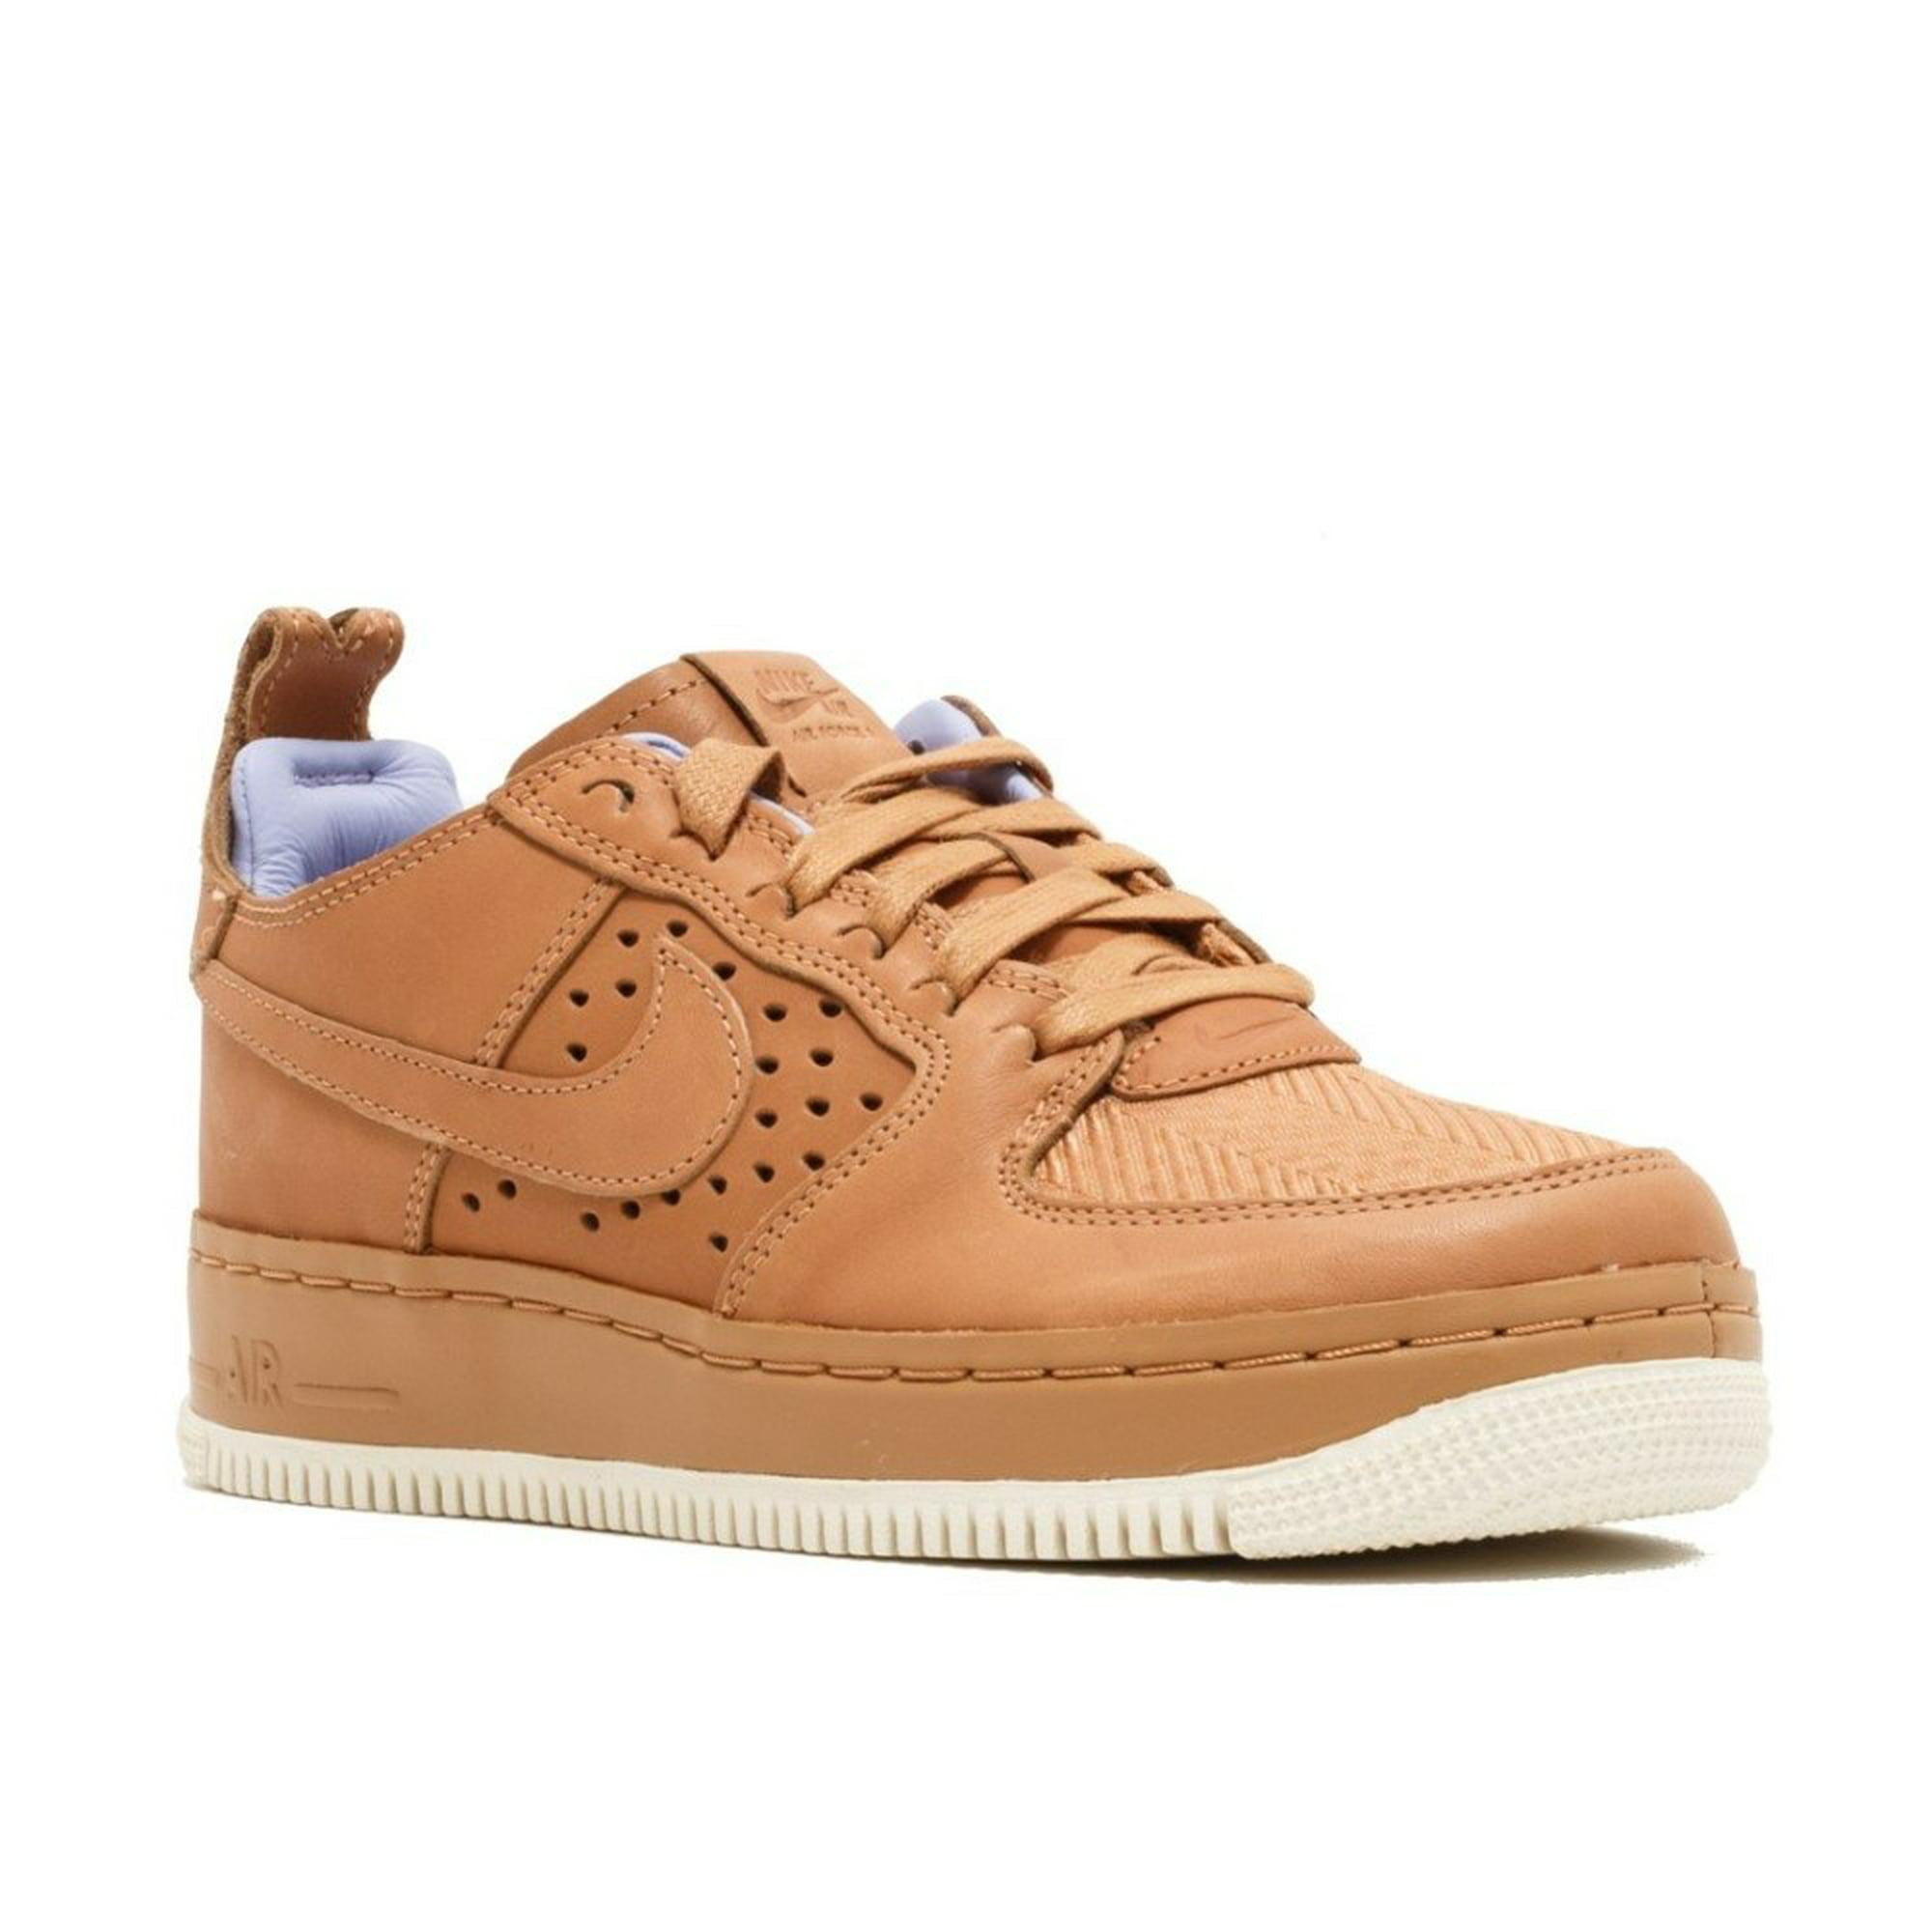 finest selection 5d66b a41b4 Nike - Men - Nikelab Air Force 1 Low Cmft Tc - 921072-200 - Size 7